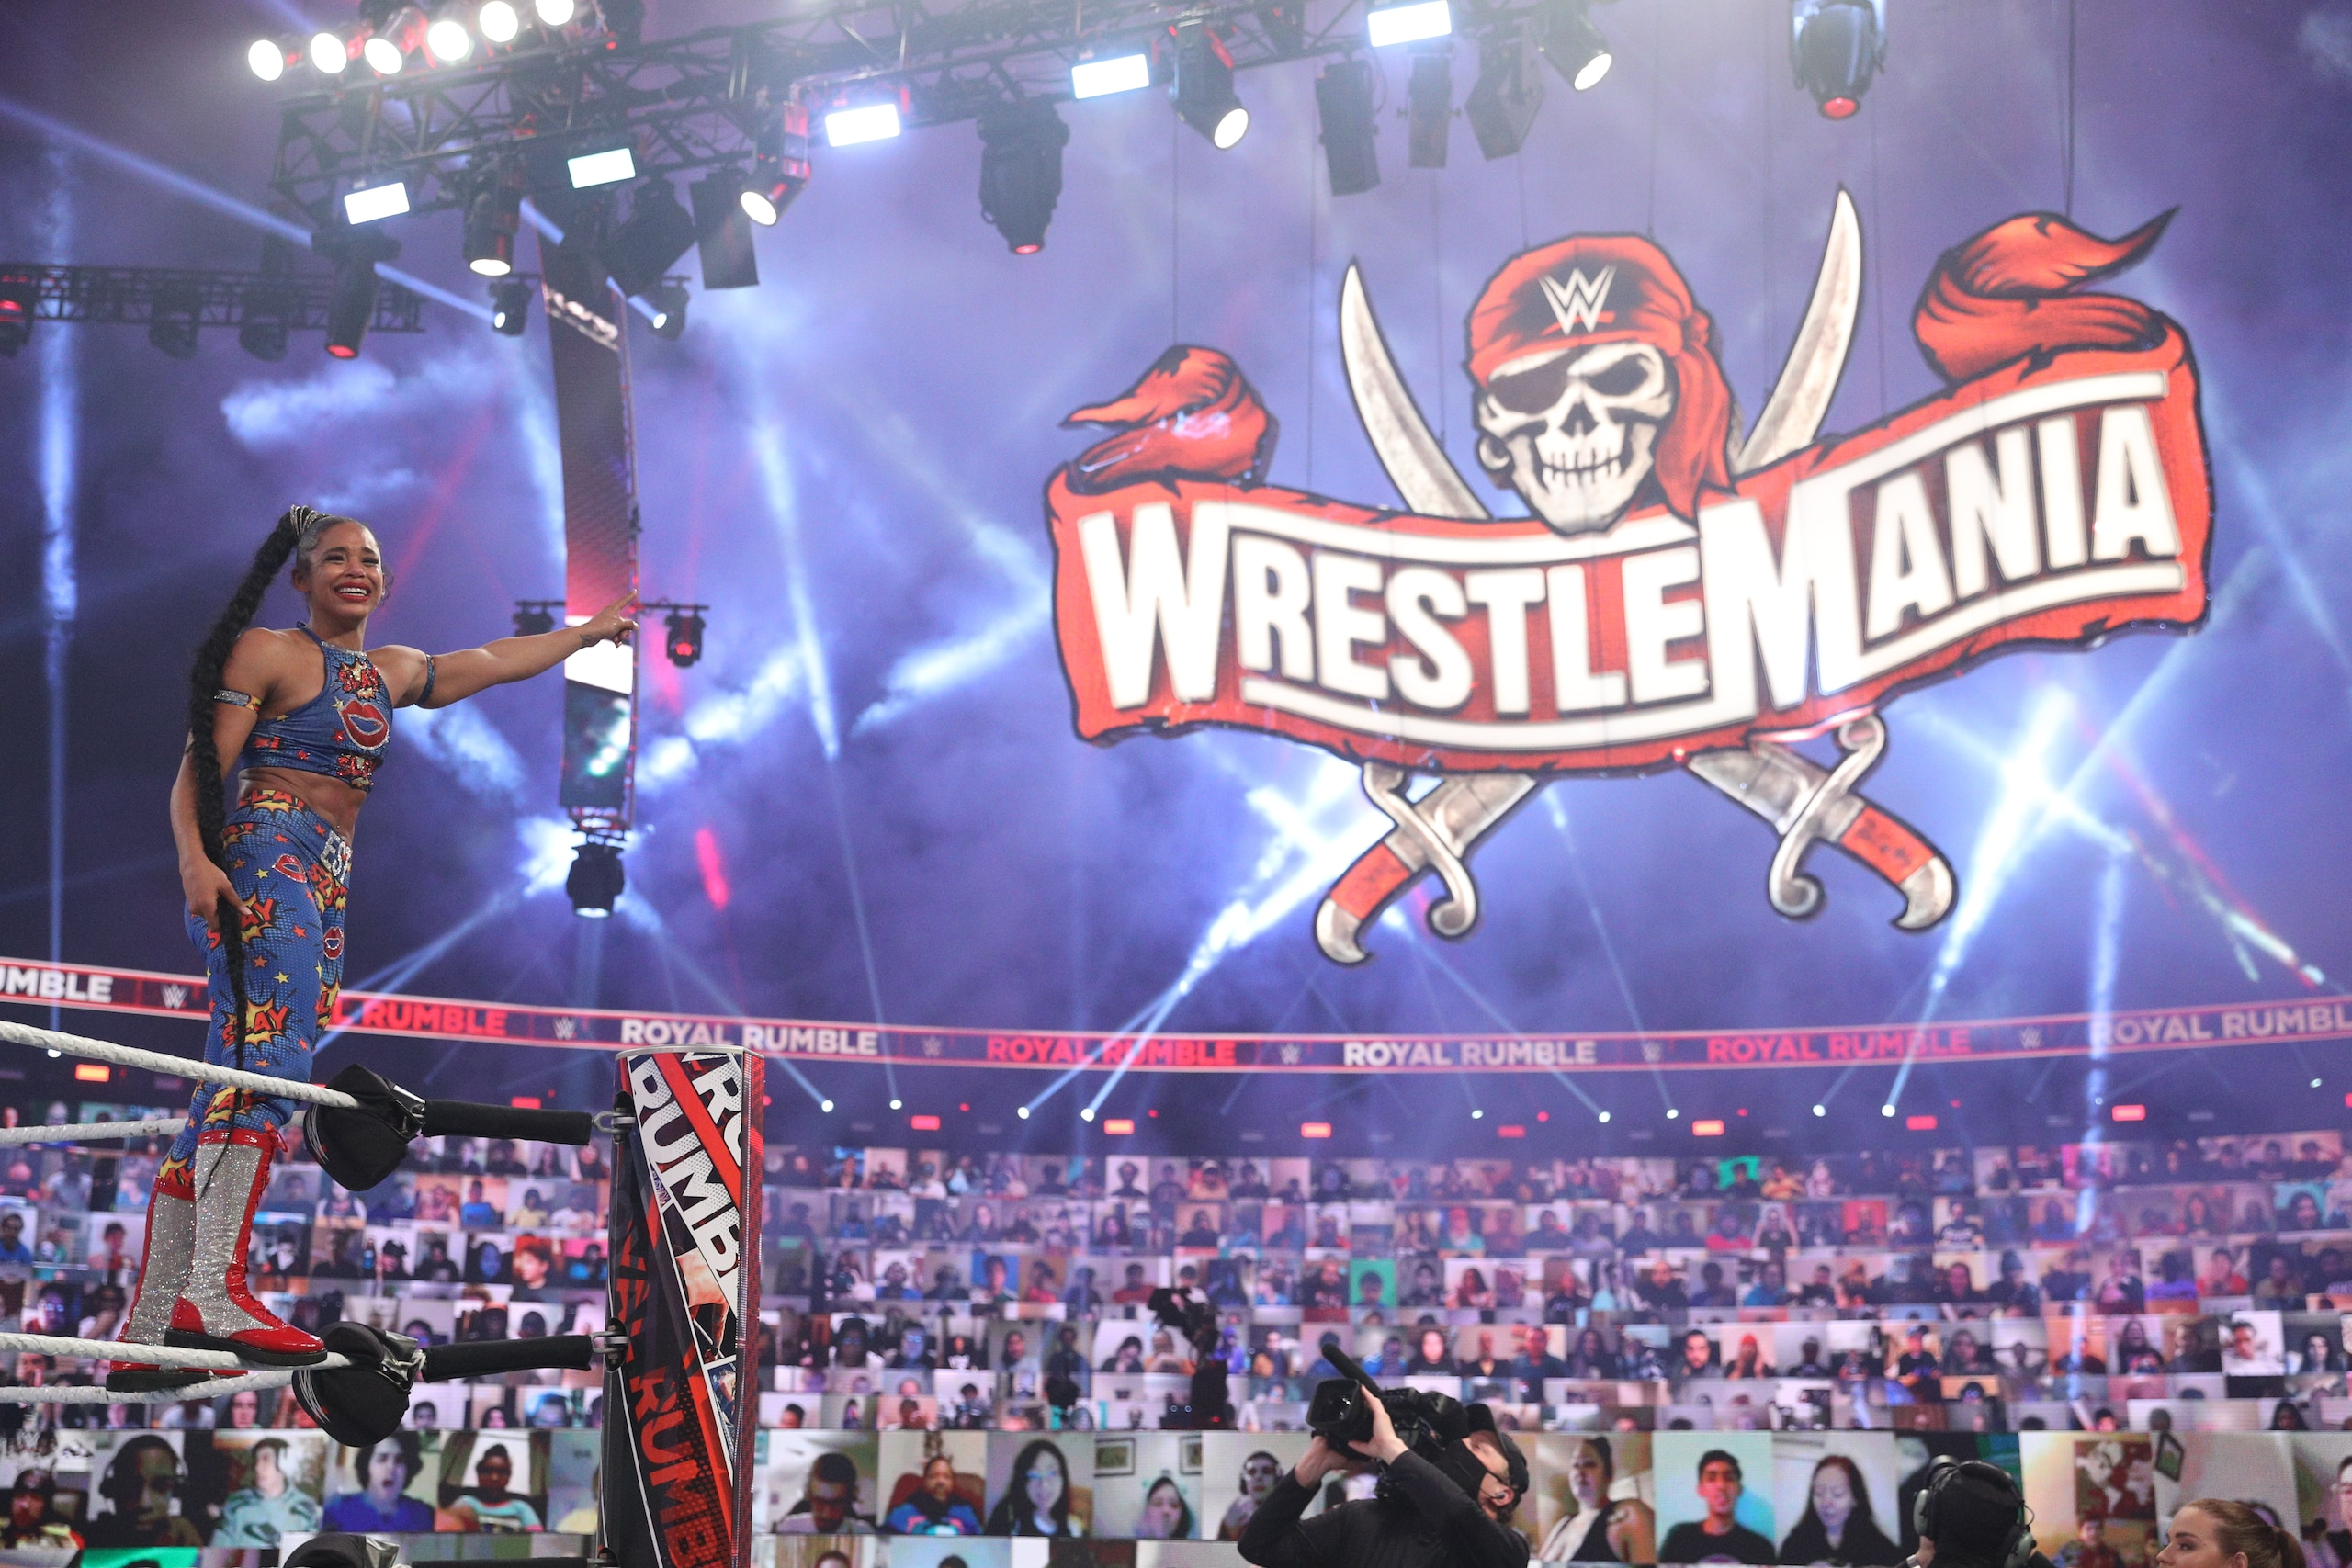 054529783 23b4bb88 f110 456b 91ab e6a8d16c286f - WWE Royal Rumble 2021, il trionfo di Edge e Bianca Belair